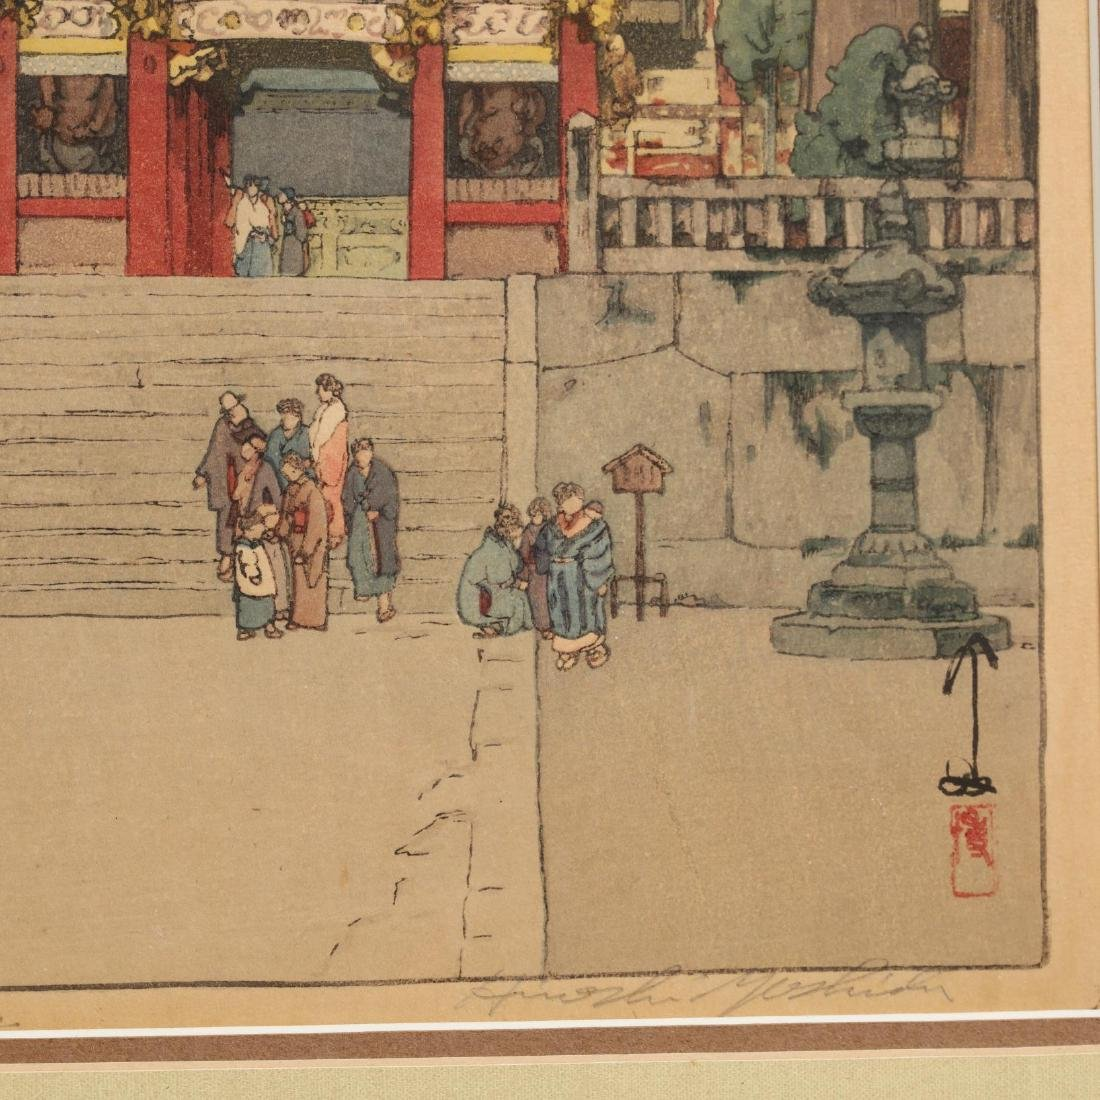 Three Japanese Woodblock Prints by Hiroshi Yoshida - 10